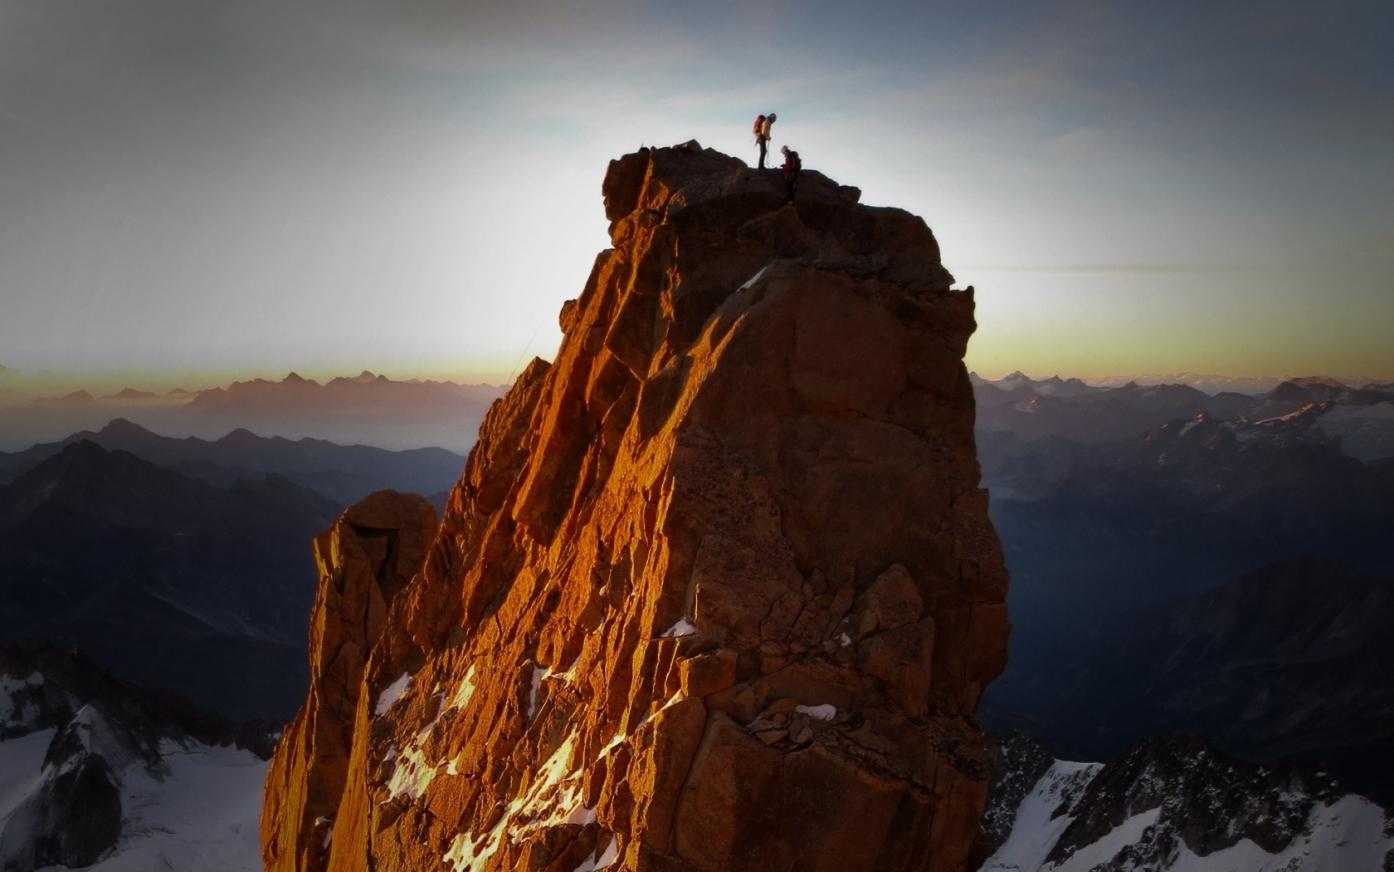 1680px-crispi-mountaineering_1500388314